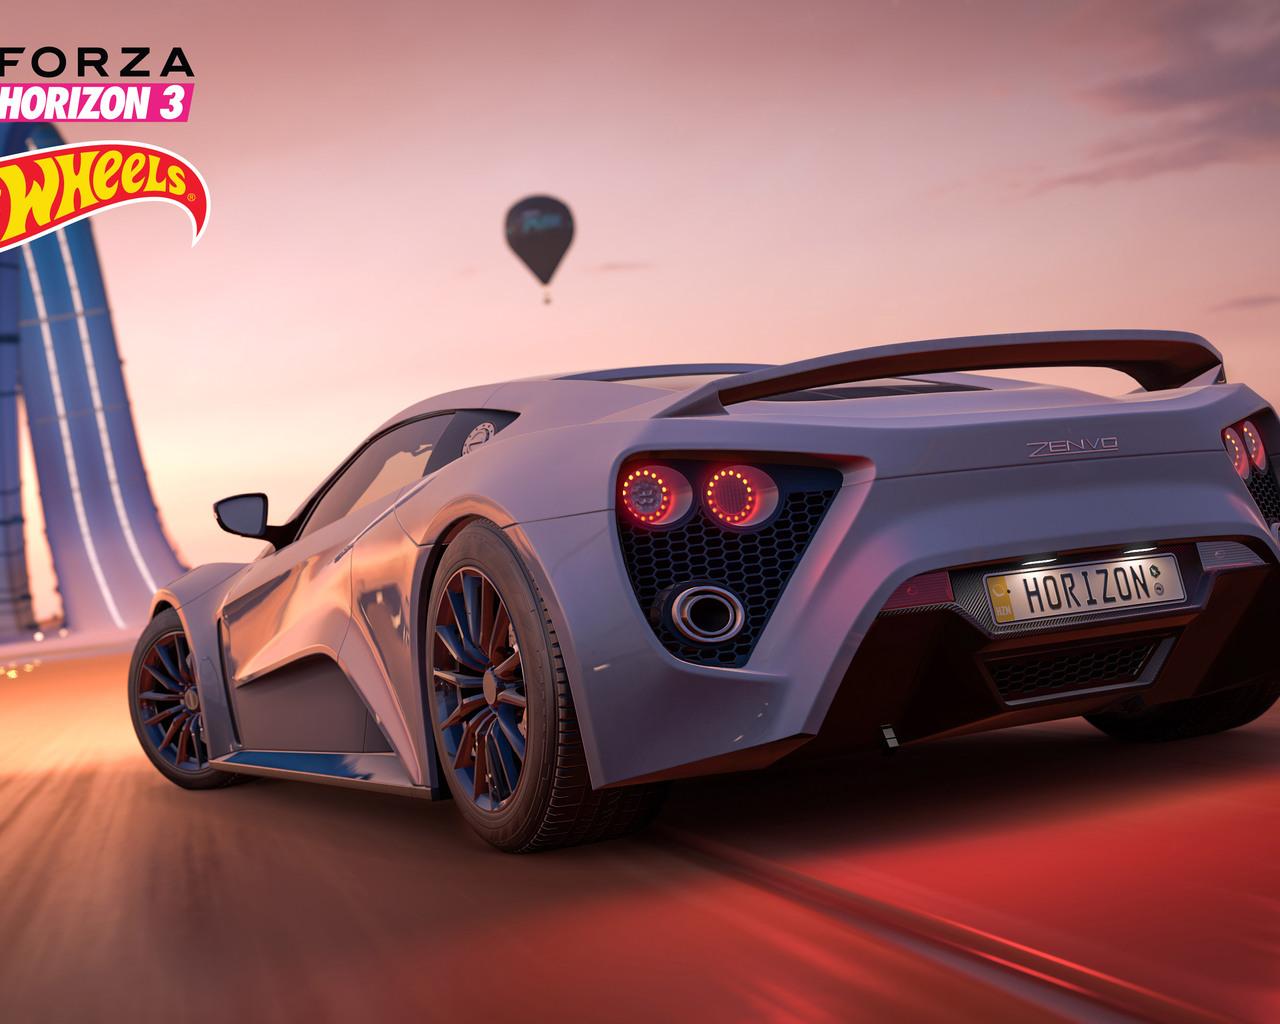 1280x1024 Forza Horizon 3 Hot Wheels 1280x1024 Resolution